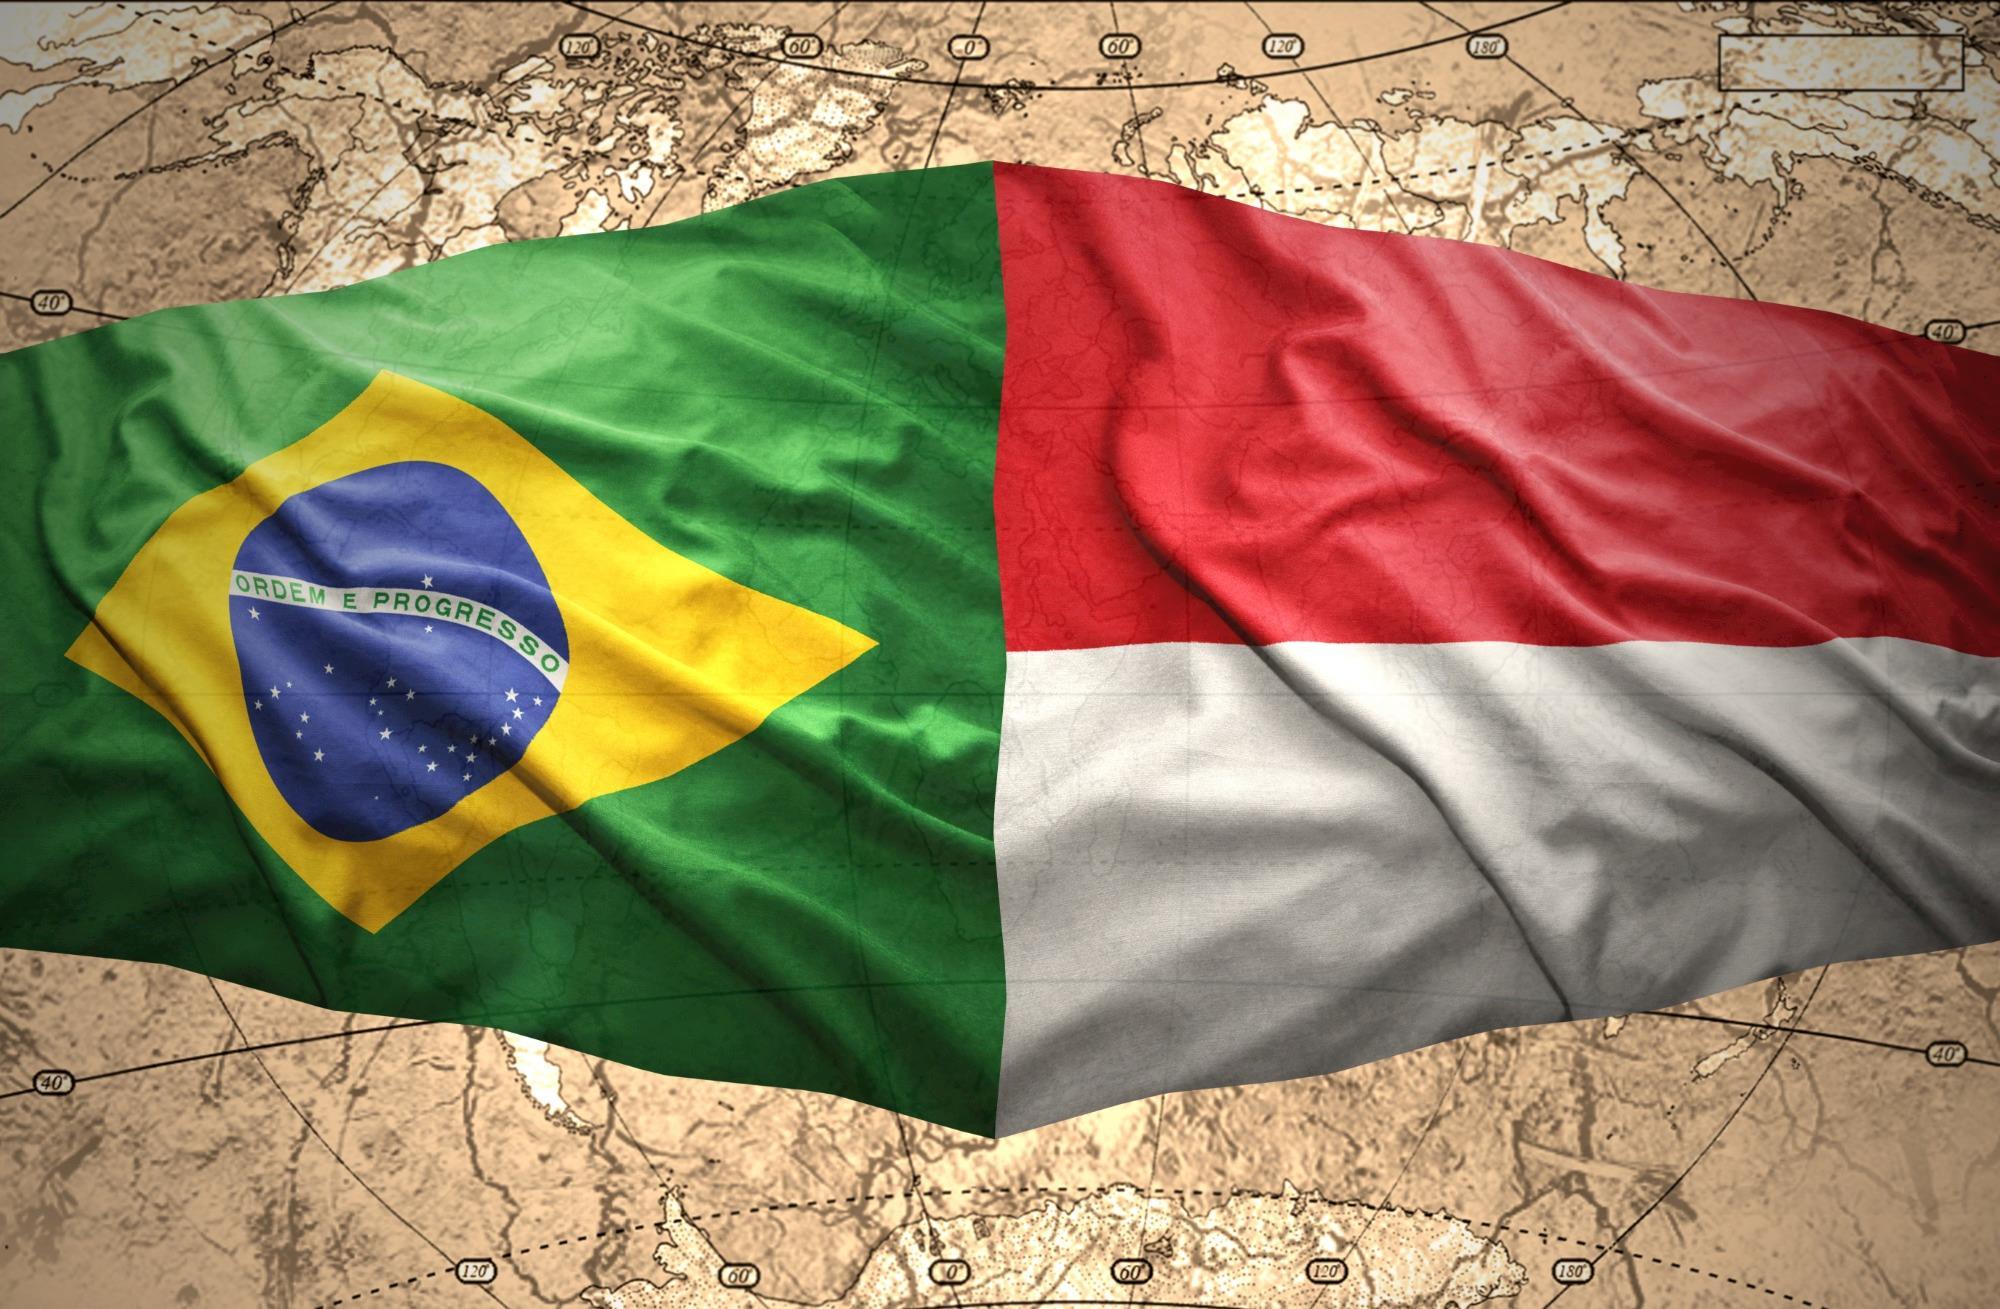 Na Indonésia, ministra negocia abertura de mercado para carnes brasileiras